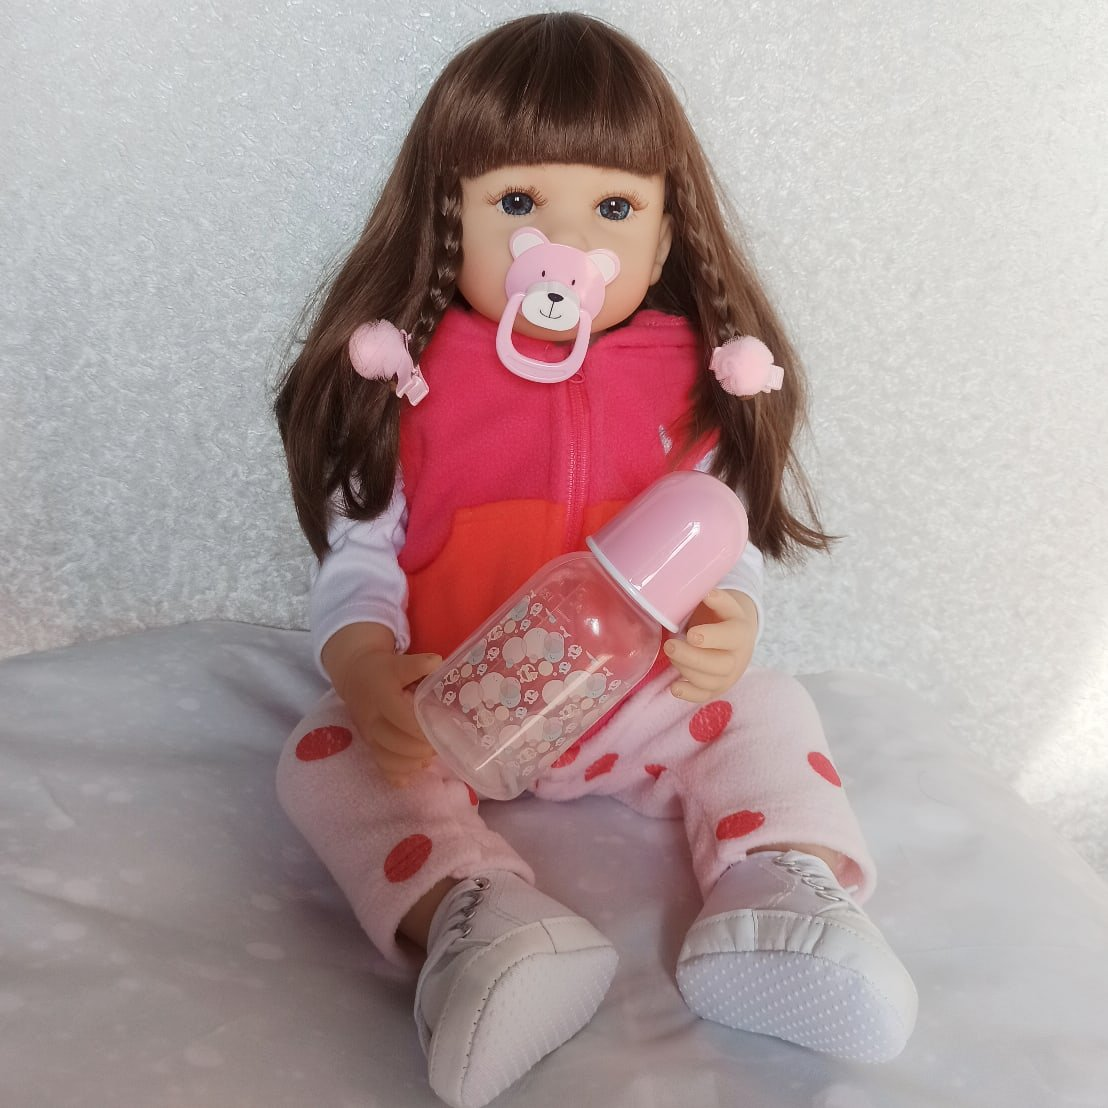 Красивая реалистичная кукла бренда NPK - отзывы